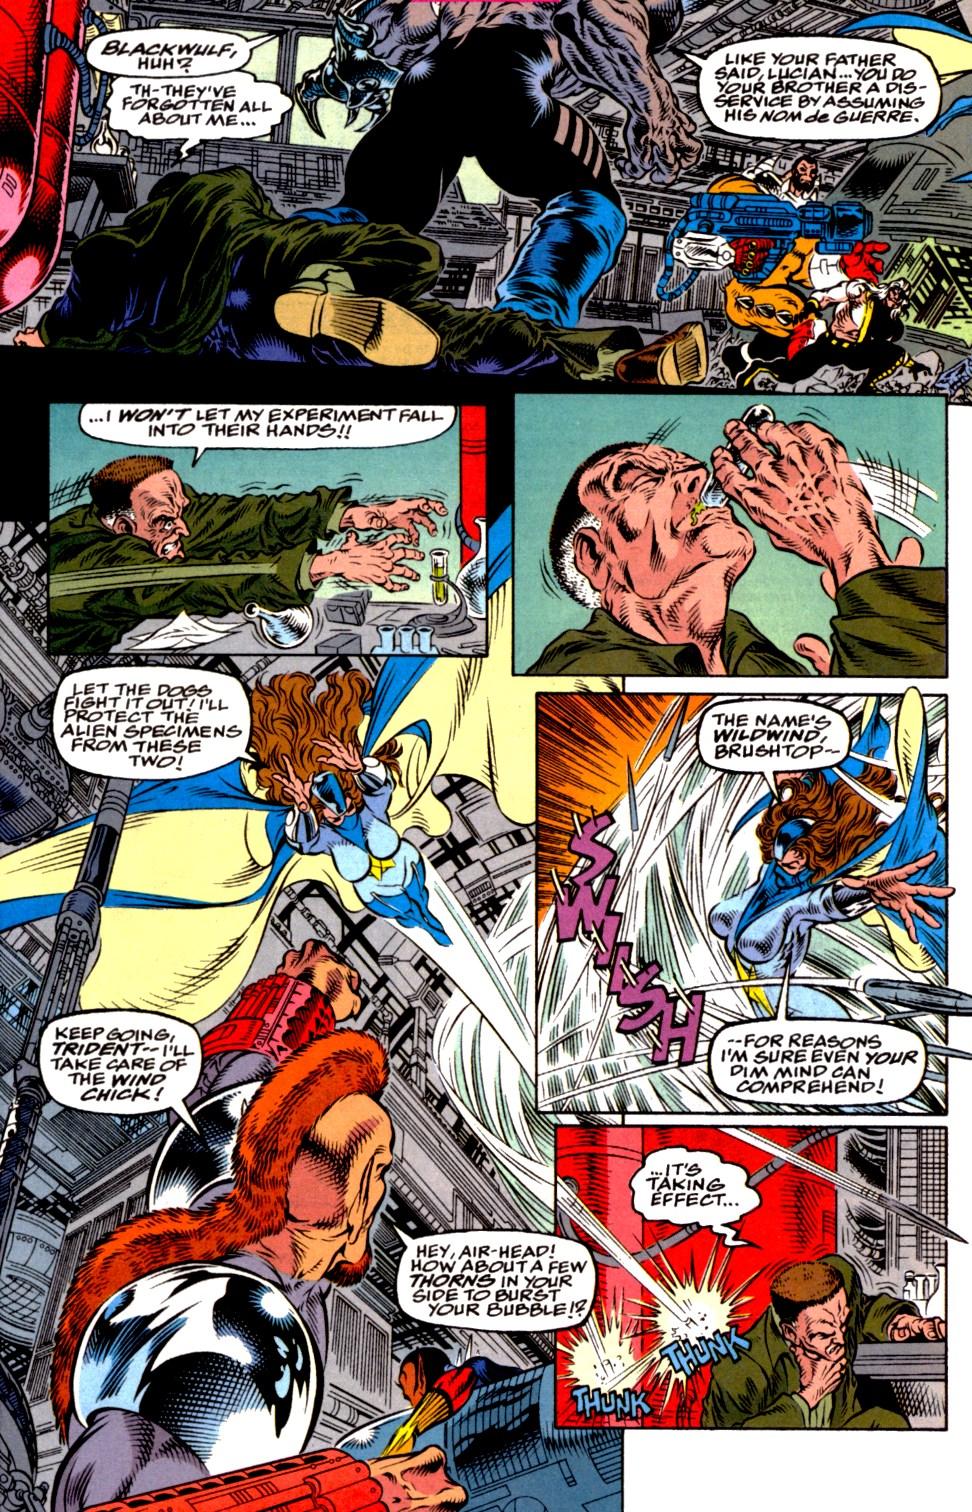 Read online Blackwulf comic -  Issue #2 - 19